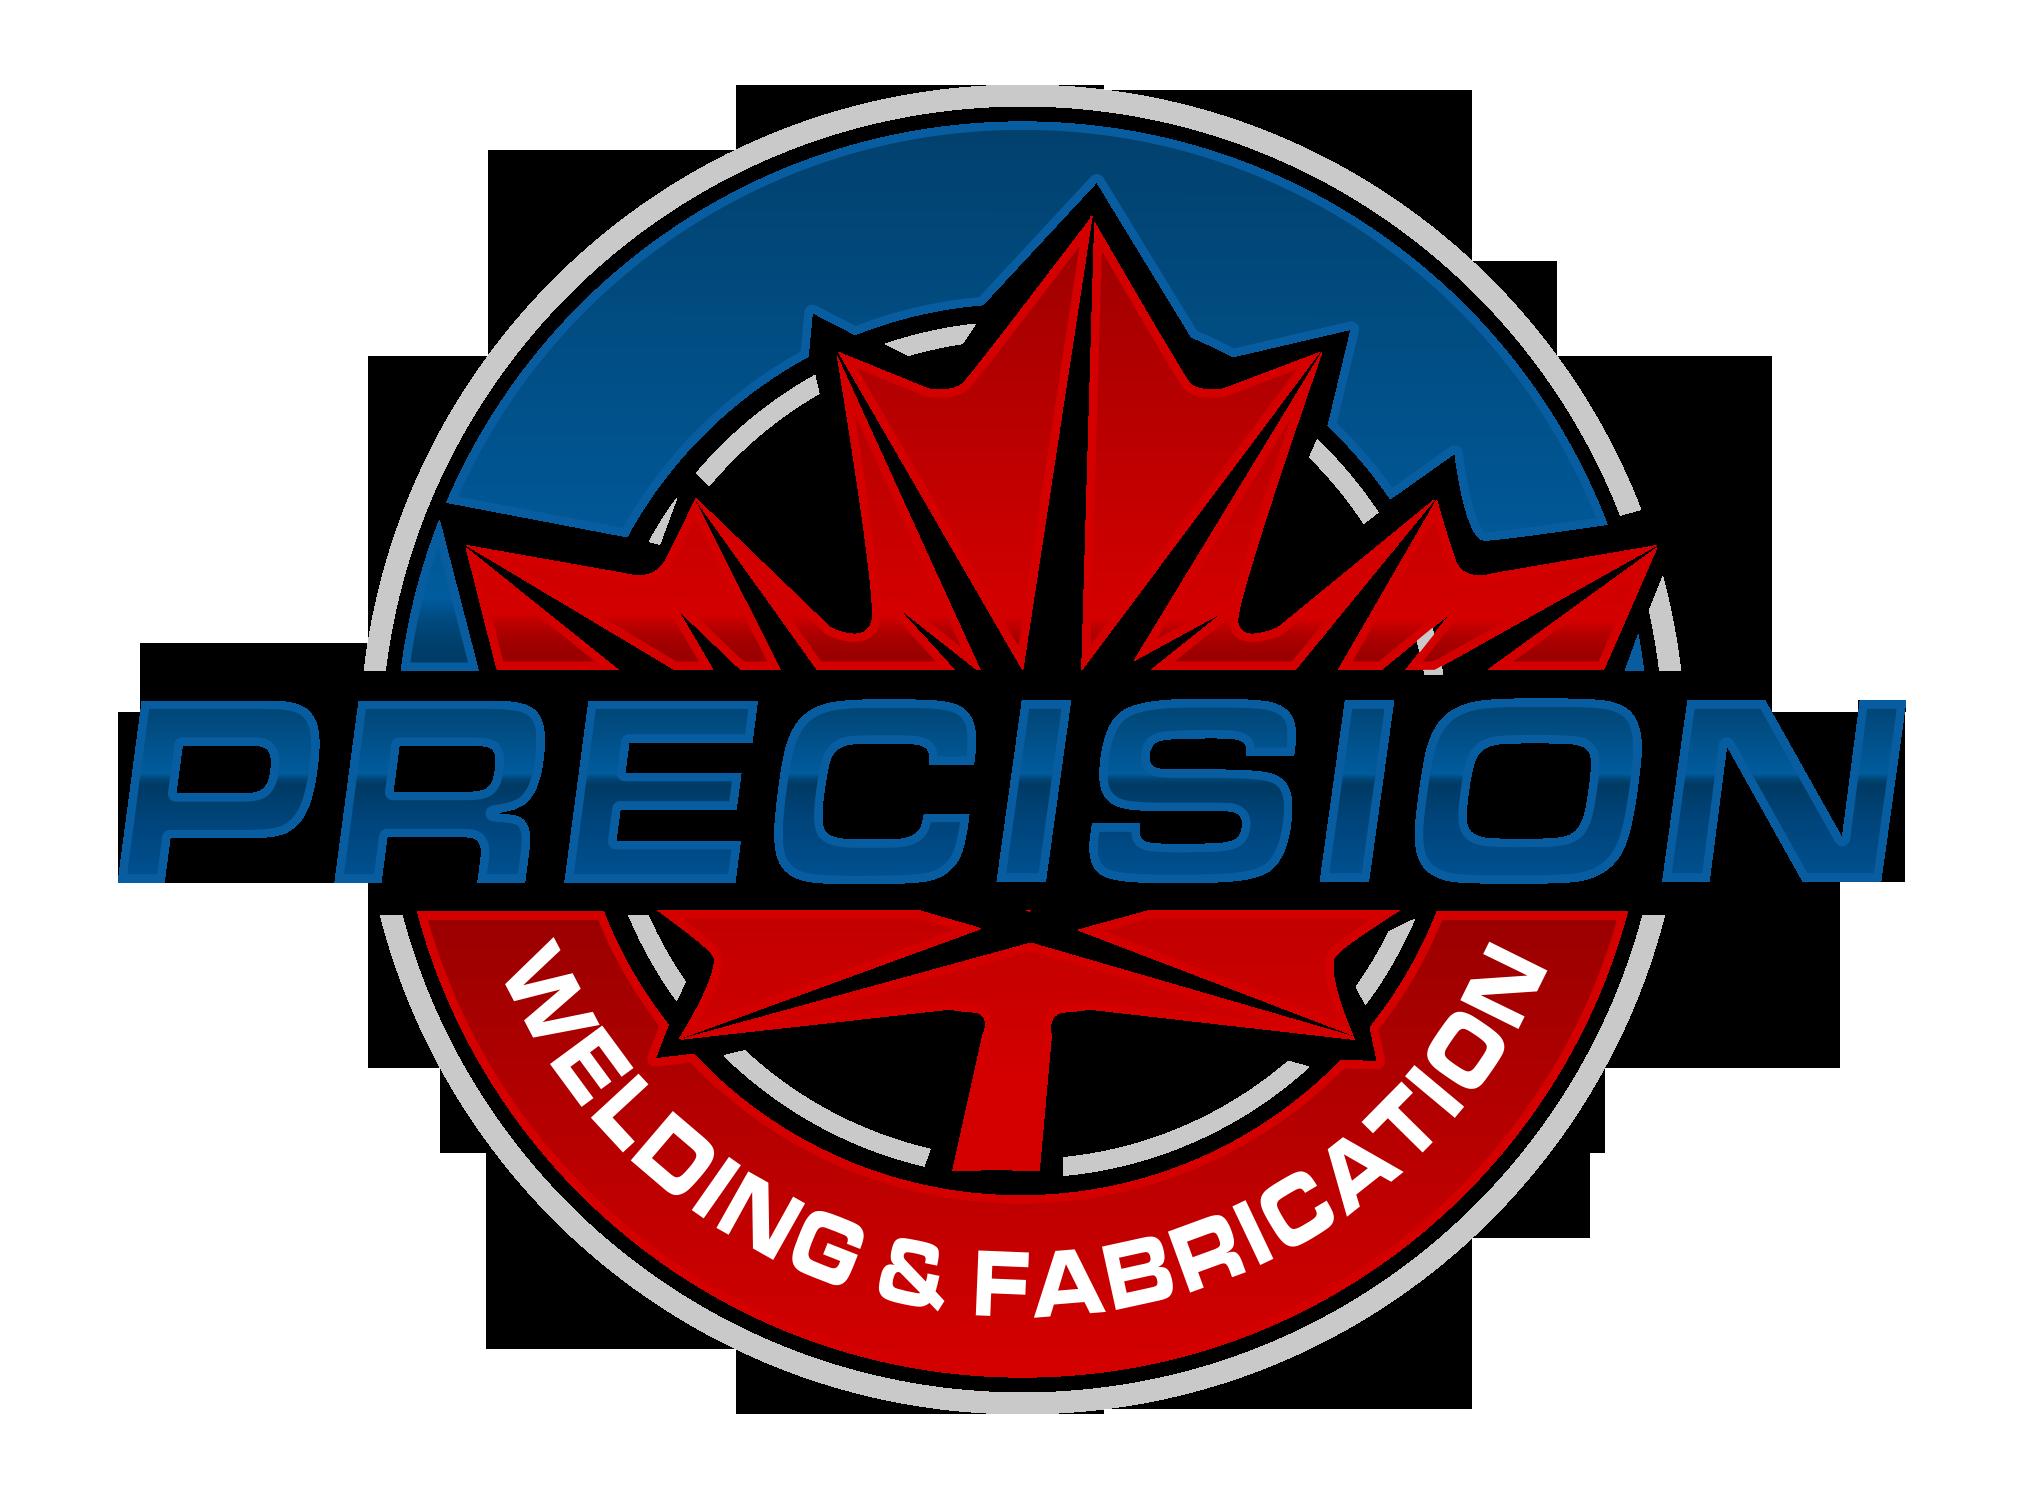 Nanaimo Precision Welding